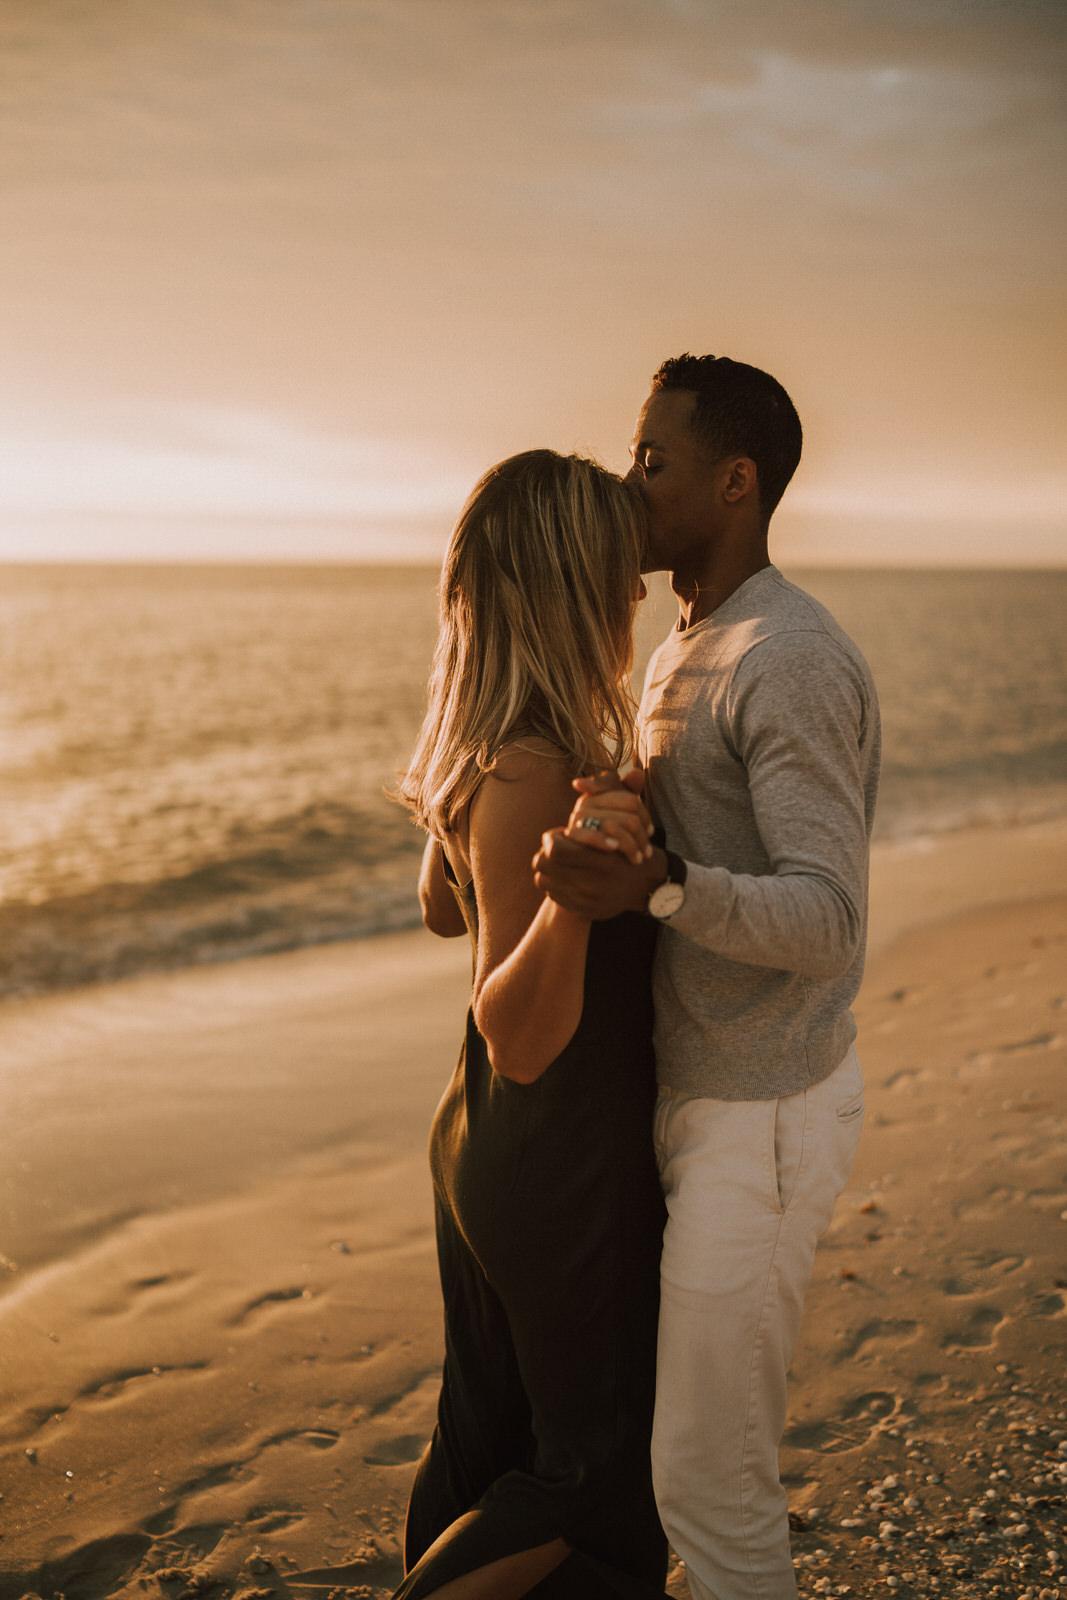 Naples 5th Ave Engagement Photos- Michelle Gonzalez Photography- Michele + Troy-305.JPG